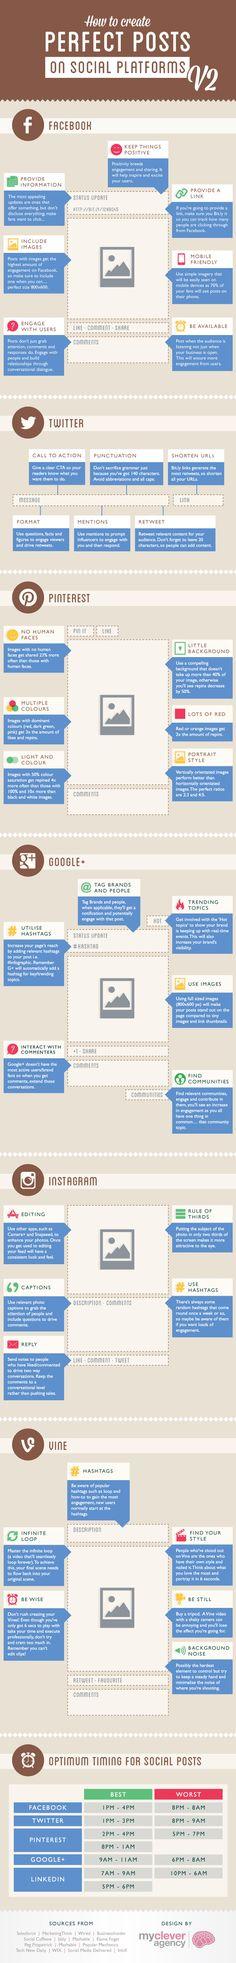 Tips to create better engagement on social media #socialmedia #facebook #twitter #pinterest #linkedin #instagram #vine #digitalmarketing #media #digitalmedia